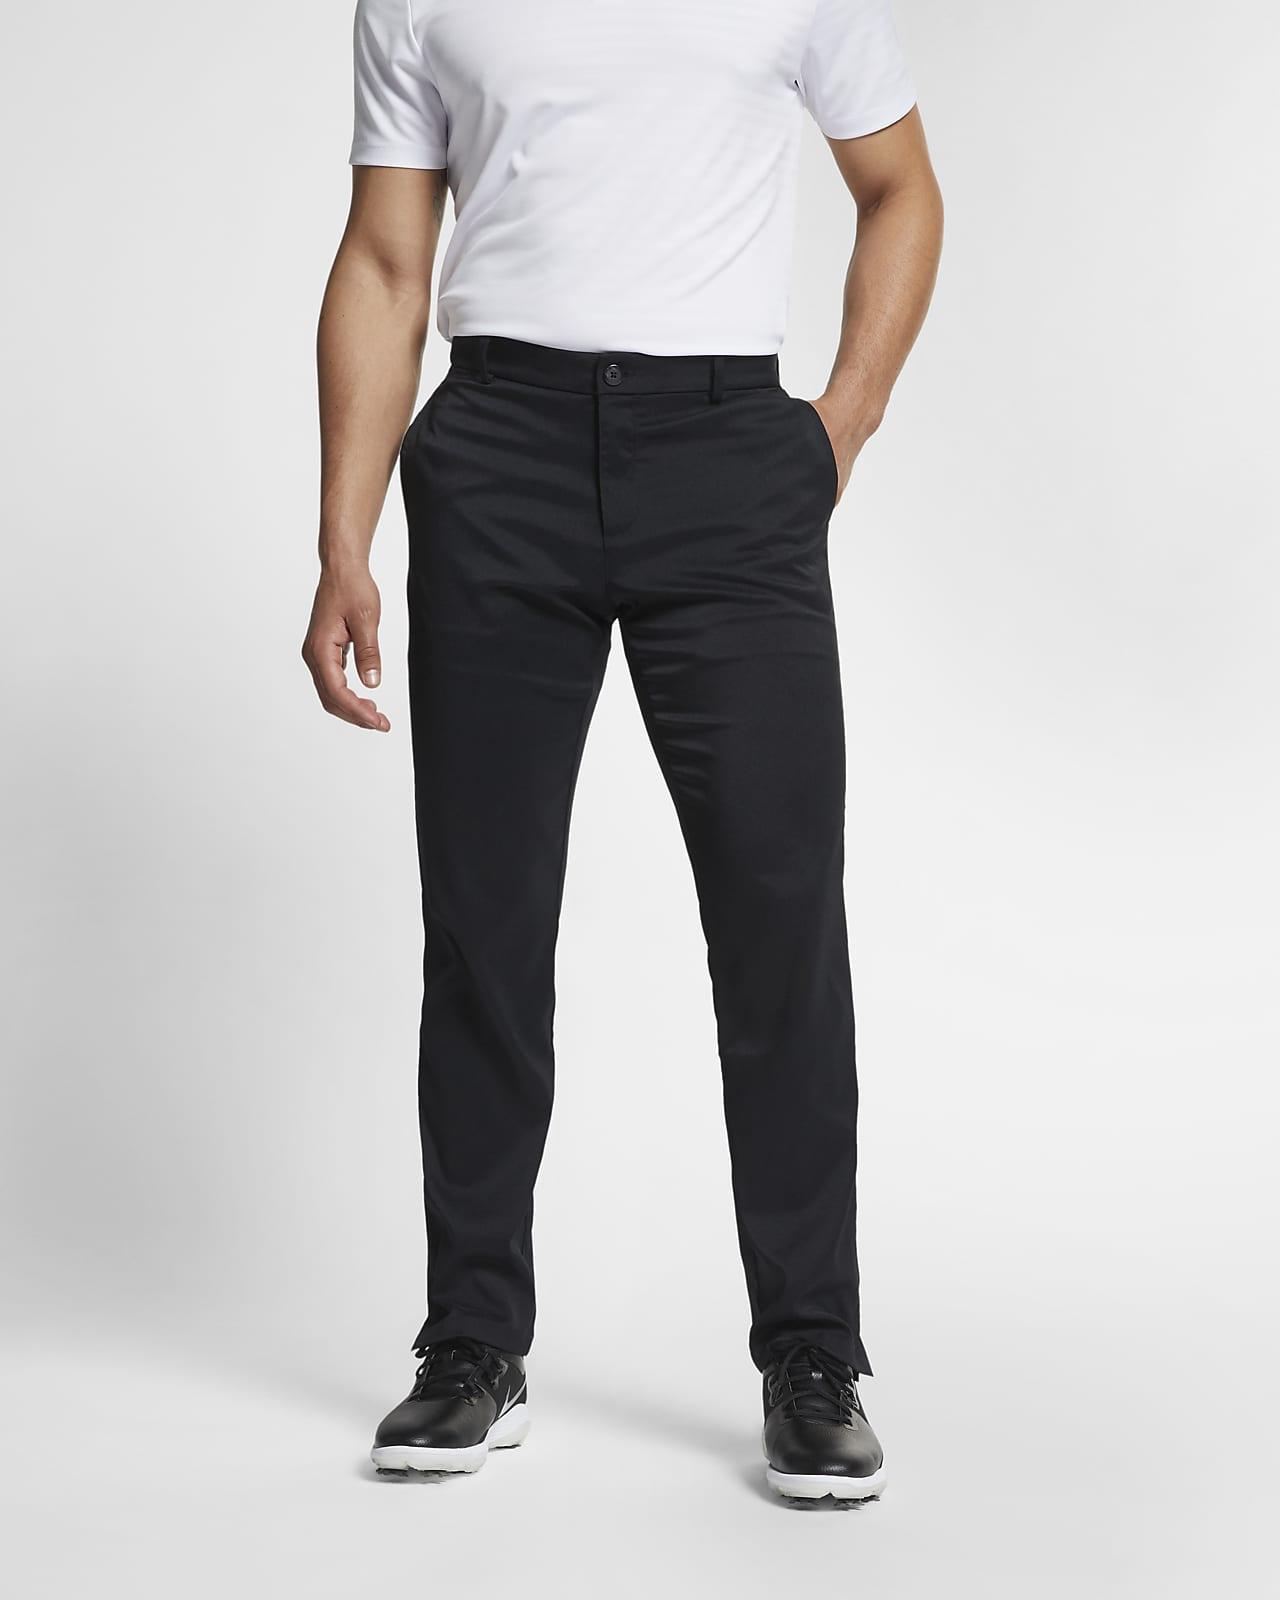 Nike Flex Men's Golf Trousers